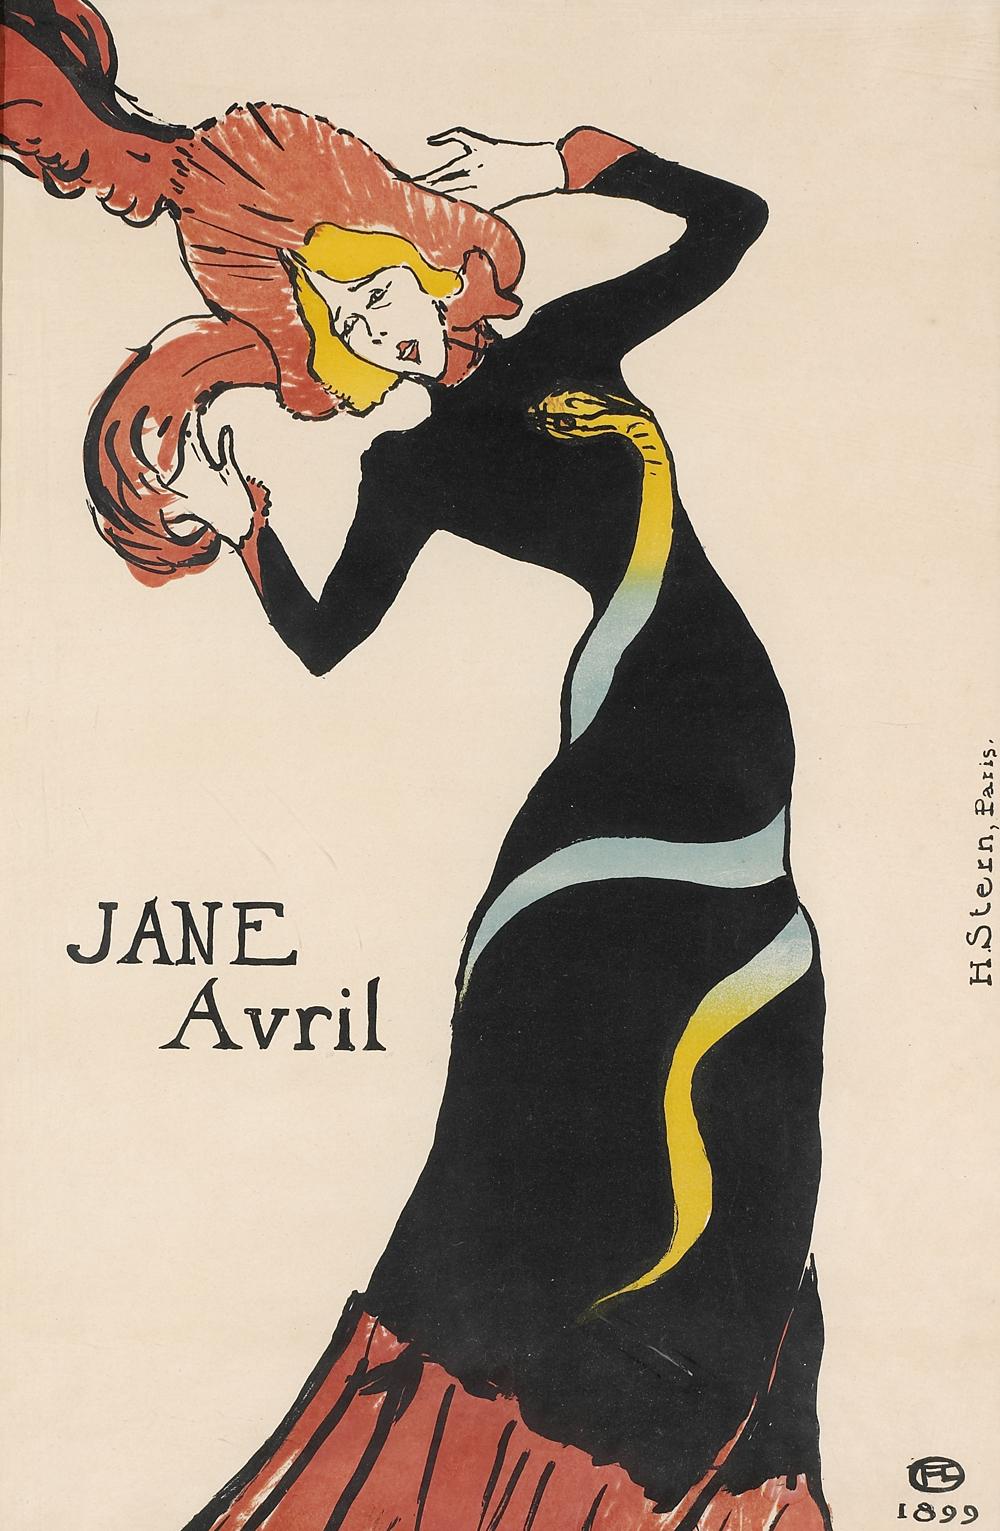 b TOULOUSE LAUTREC Jane Avril 1899